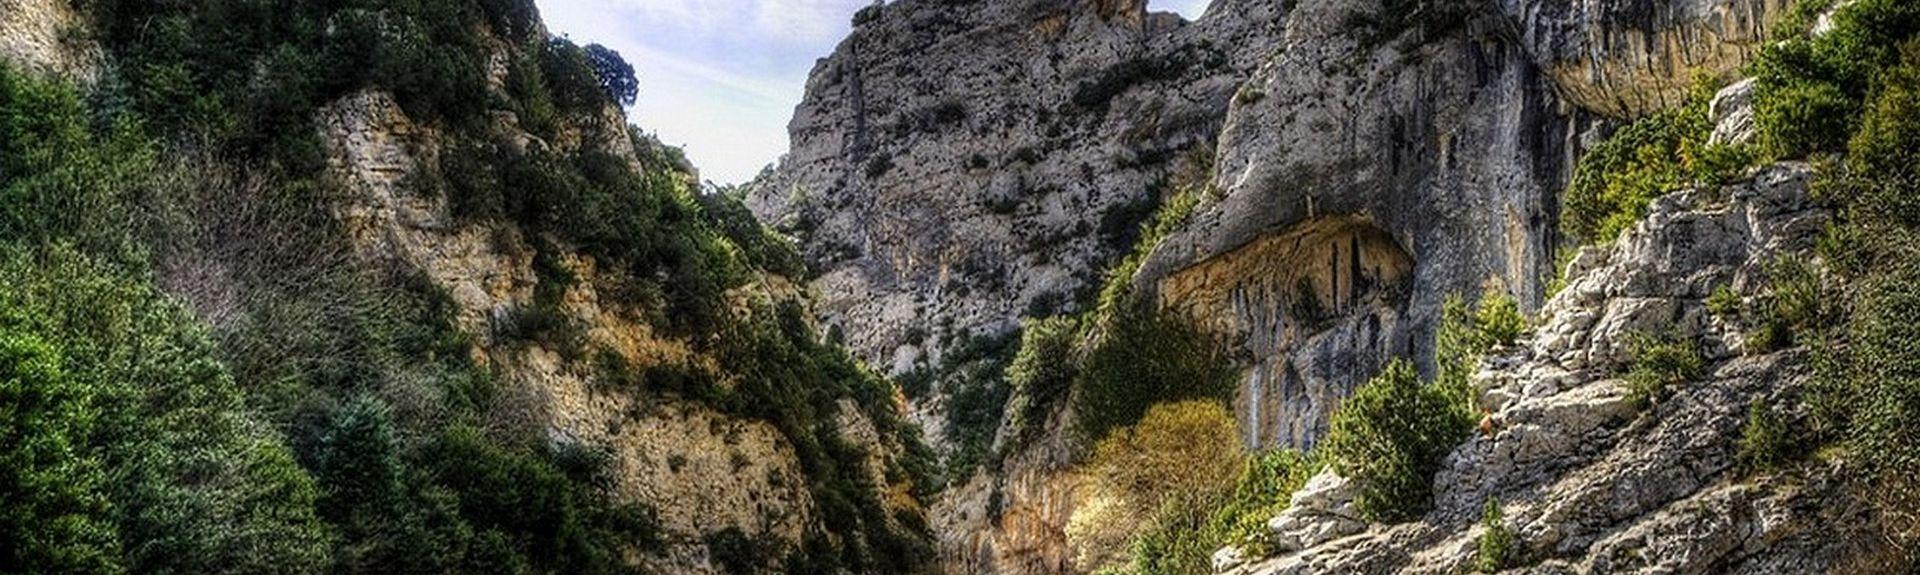 Salas Altas, Huesca, Spain